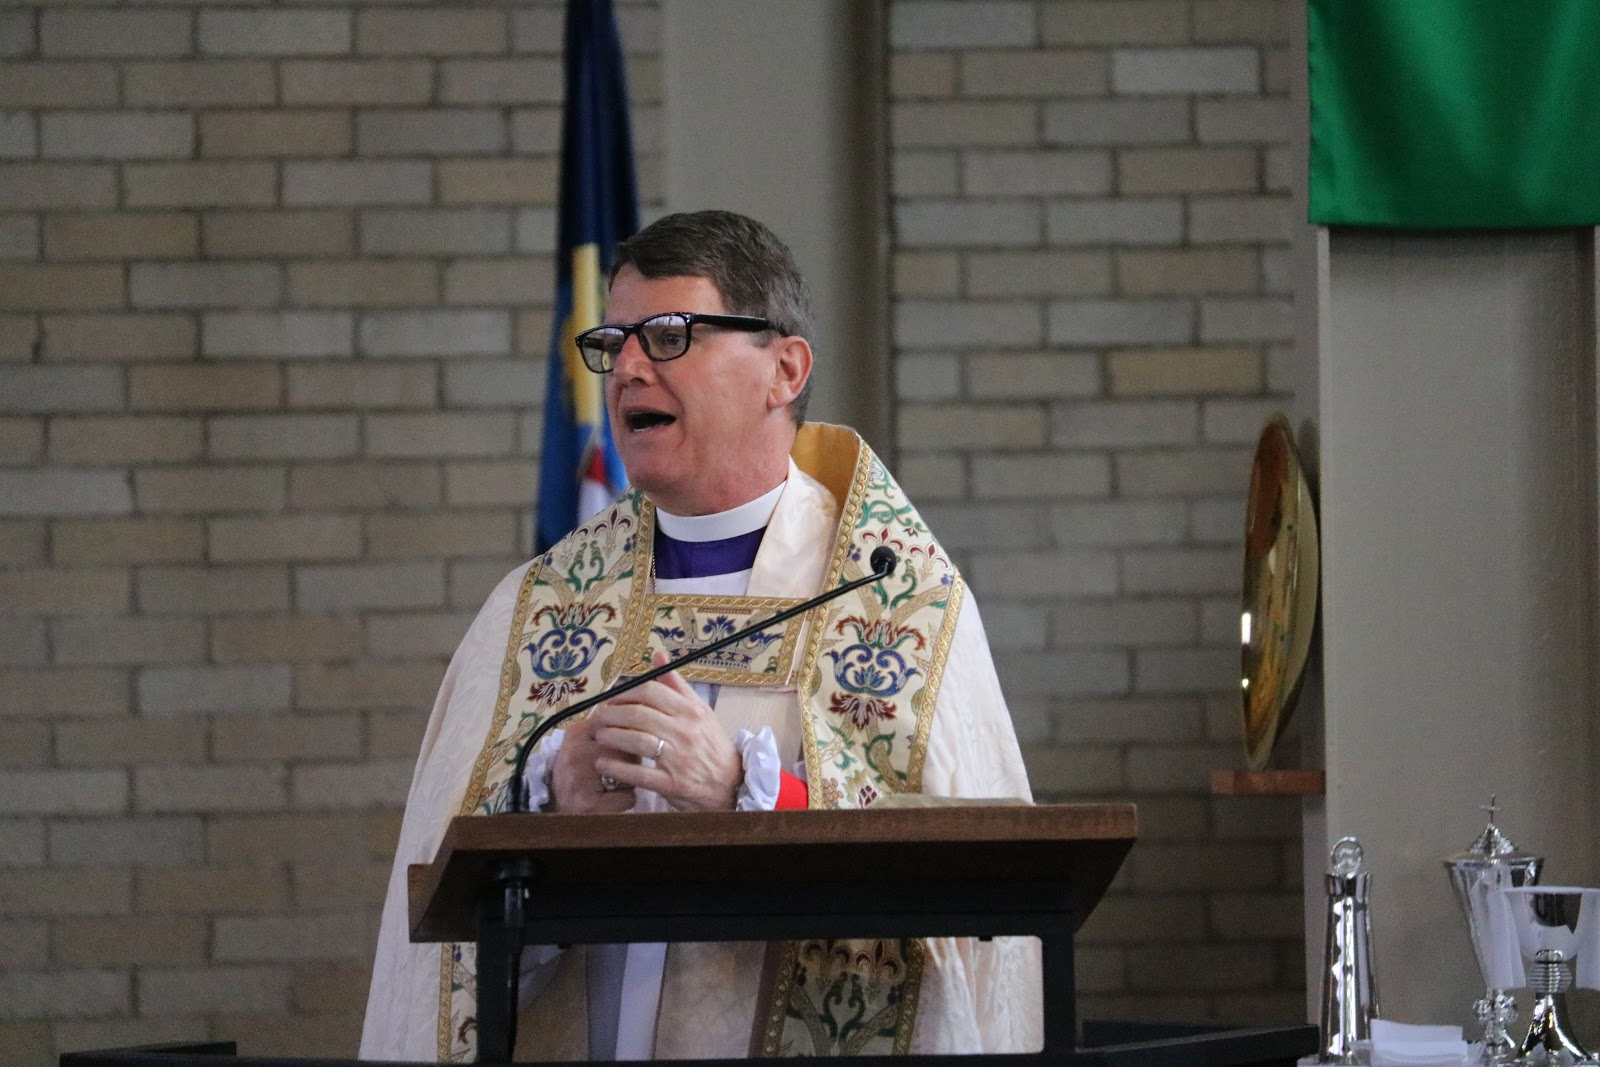 Bishop Hobby's Visit 11-5-17